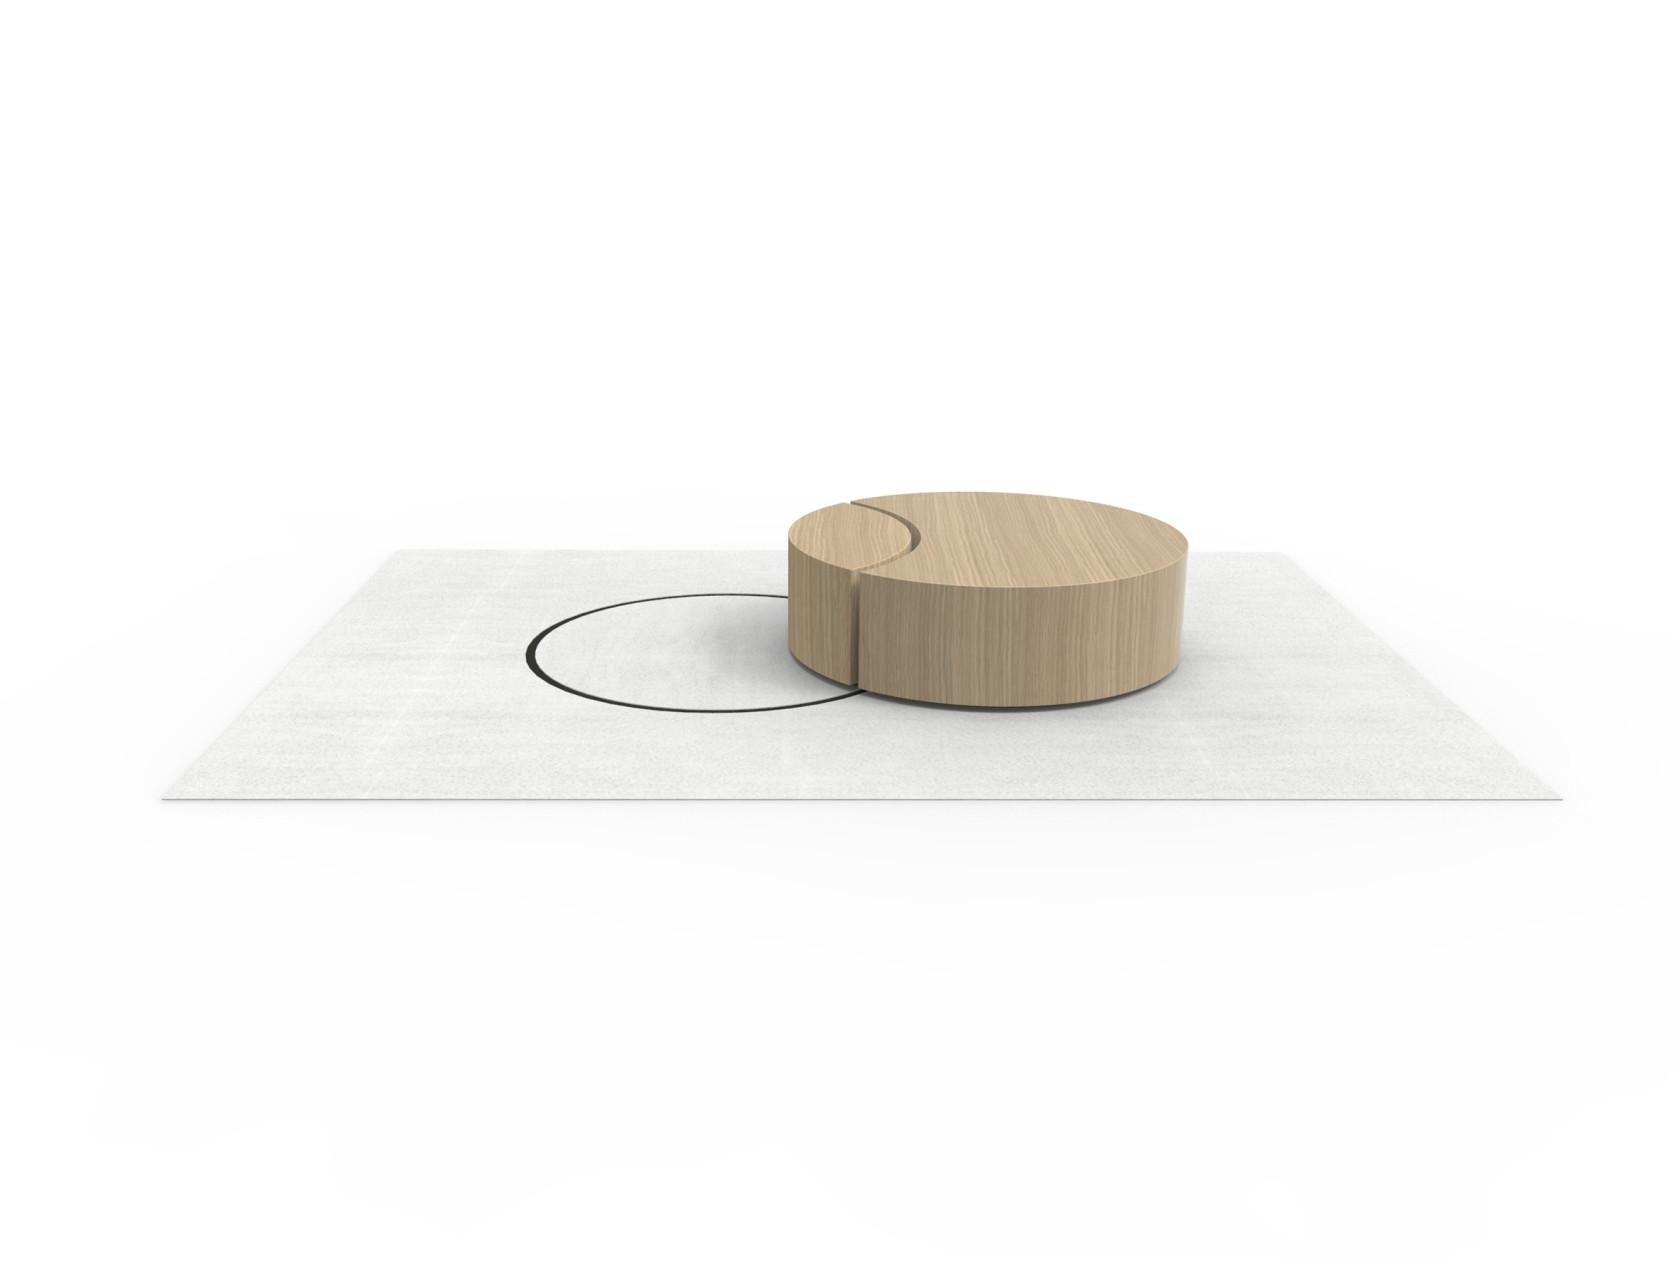 fran ais table basse eclipse ludovic avenel b niste cr ateur. Black Bedroom Furniture Sets. Home Design Ideas